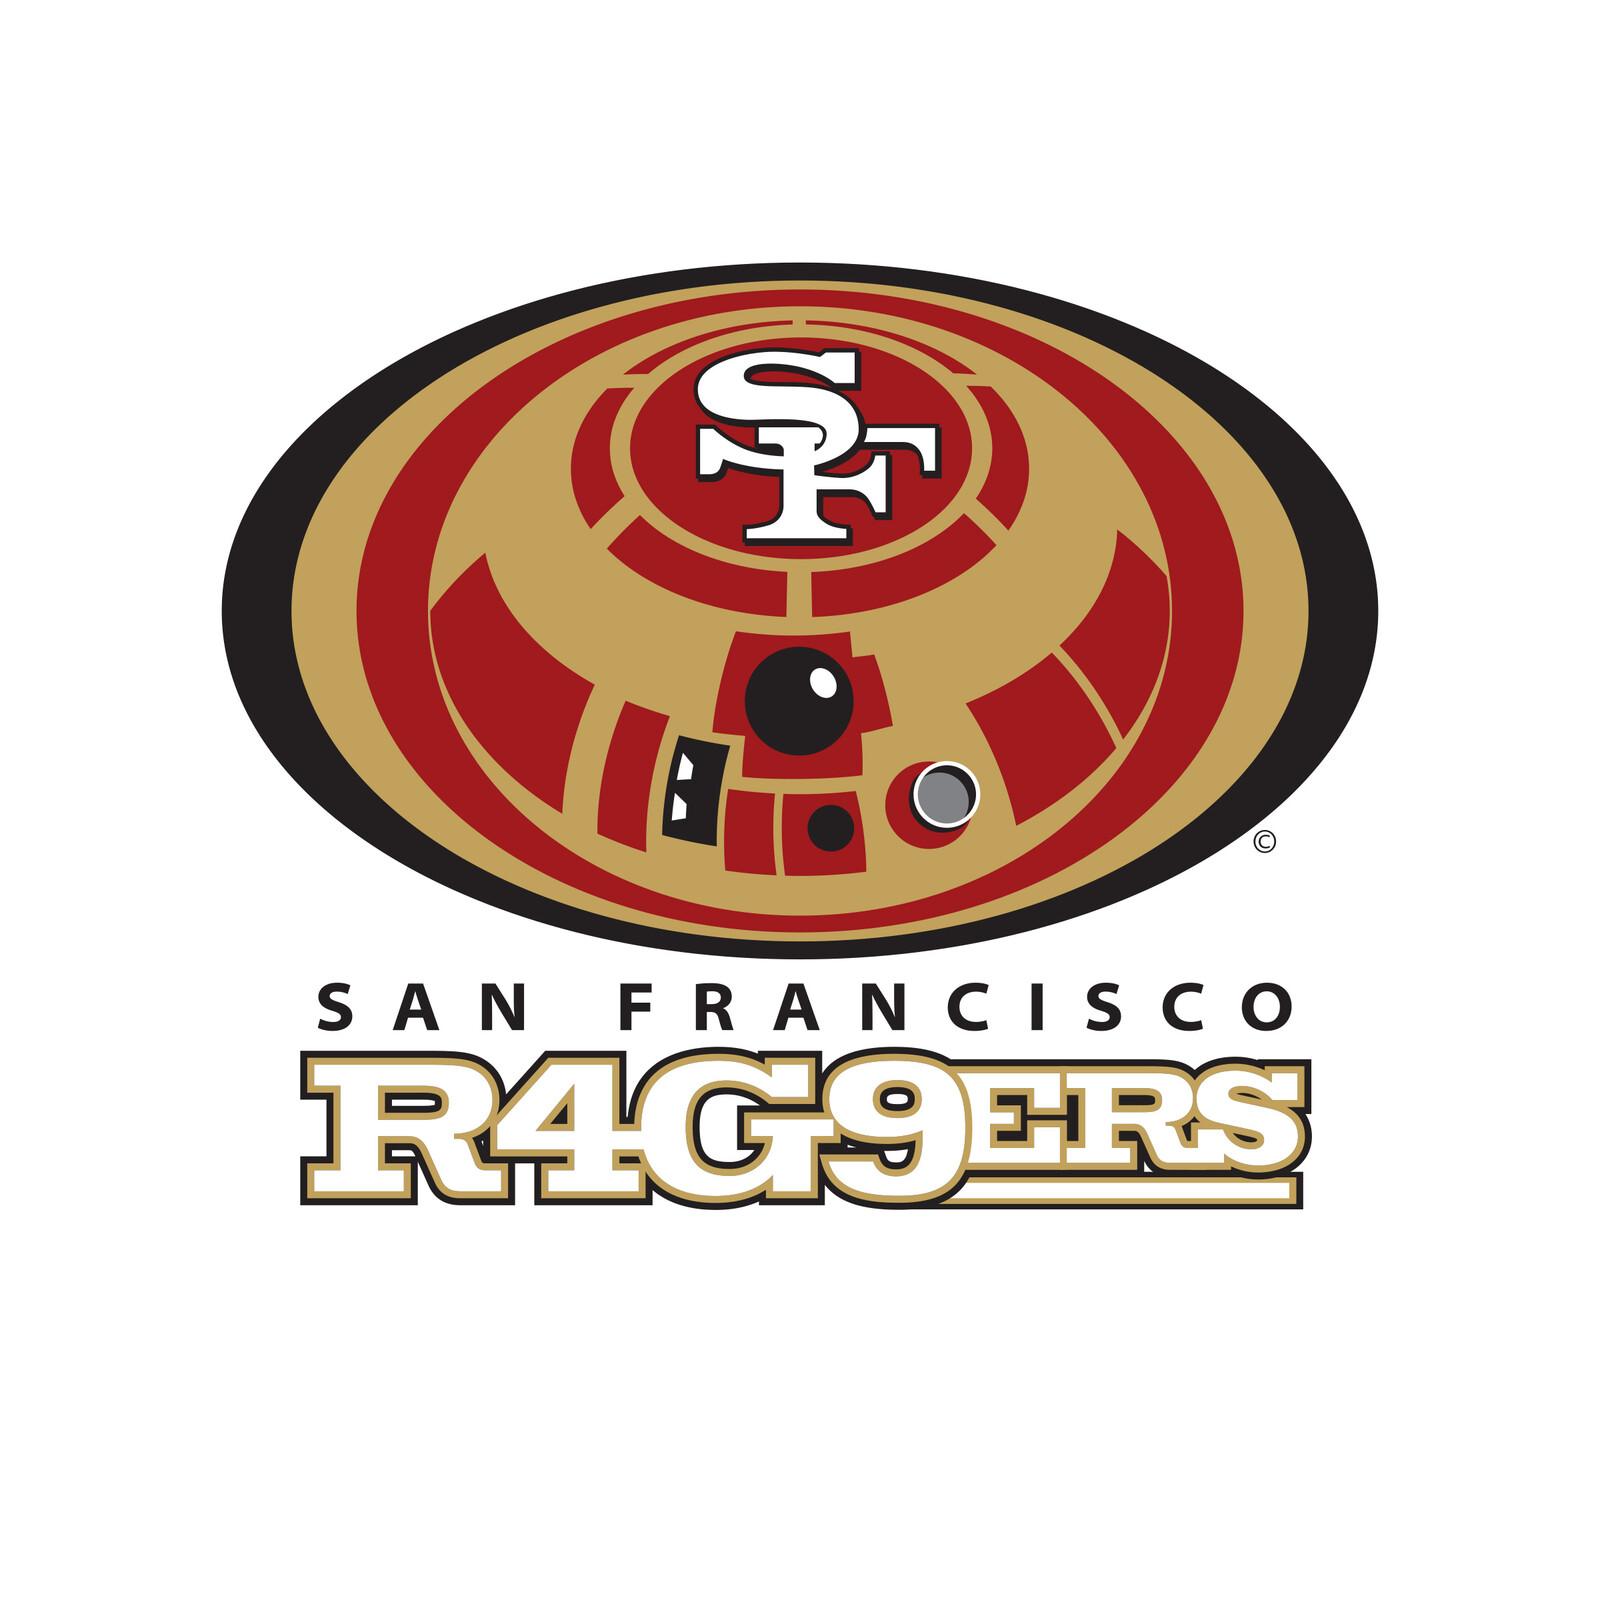 San Francisco R4G9ers